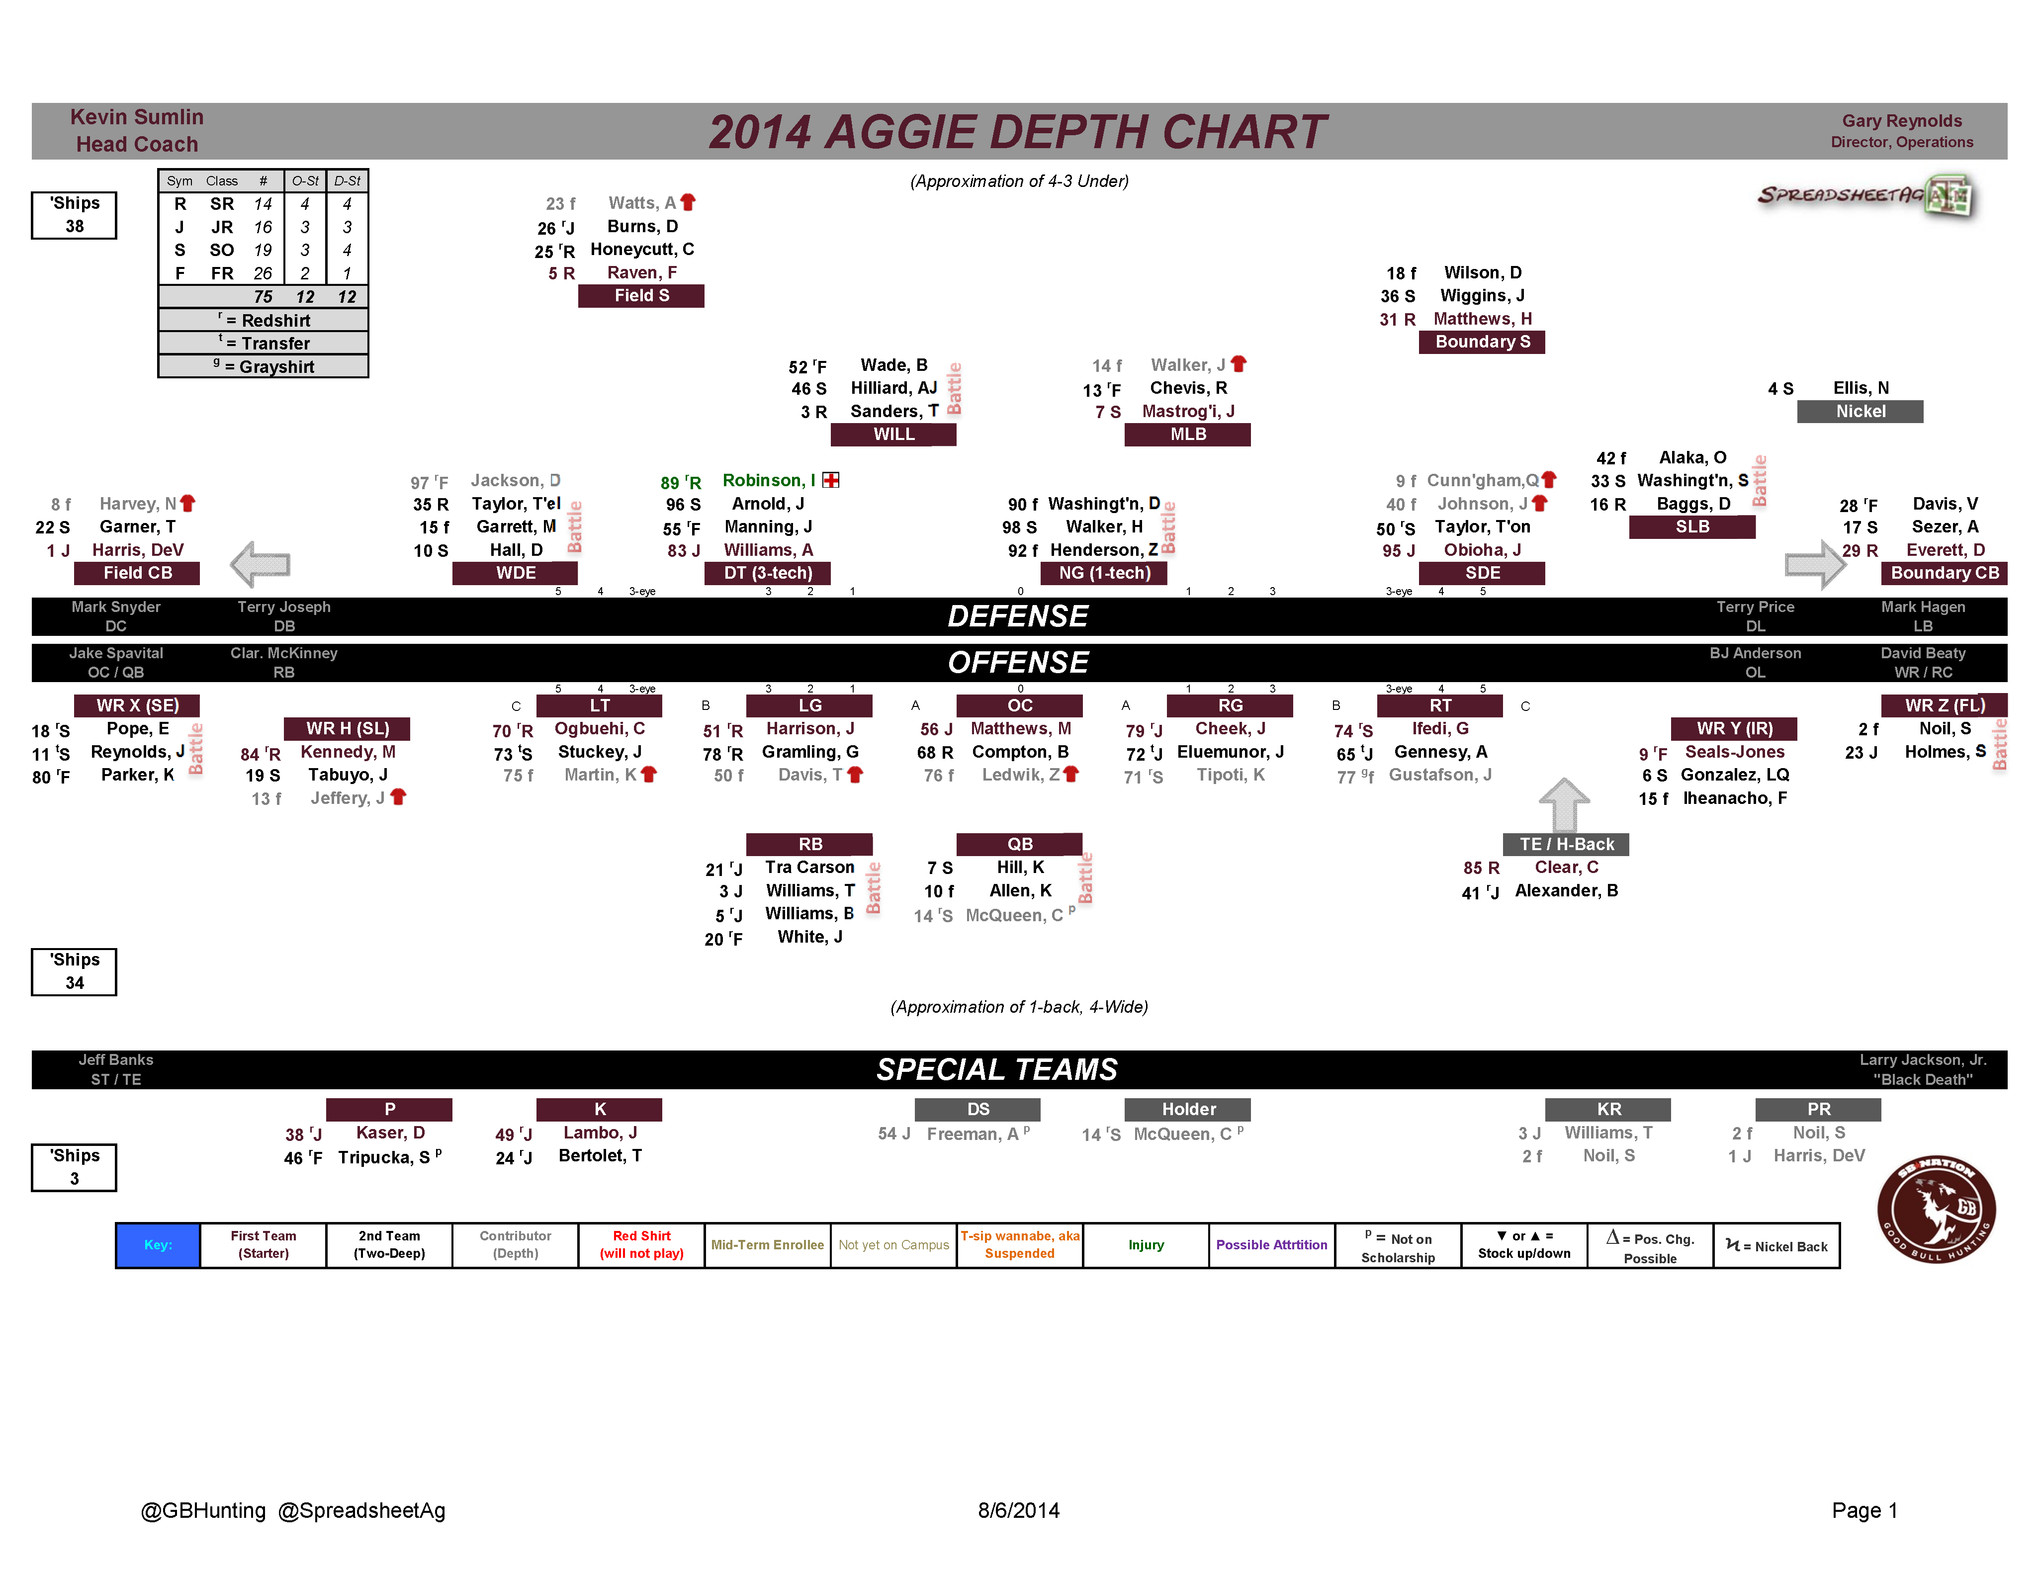 Football Depth Charts Templates Texas A&m Football 2014 Depth Chart Good Bull Hunting